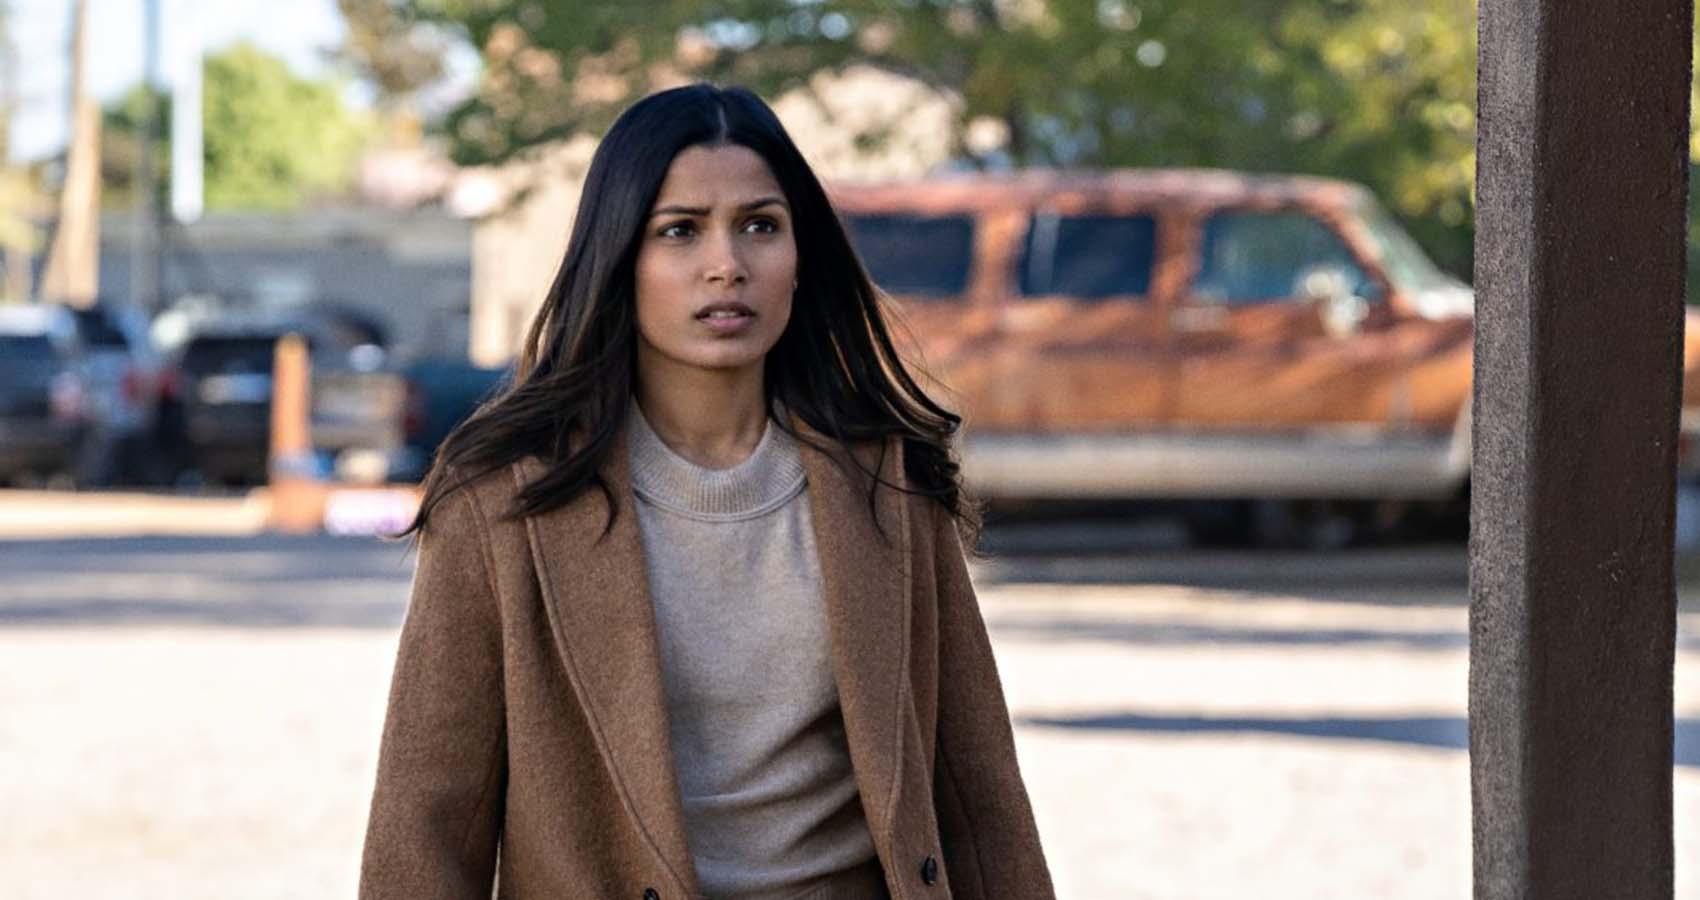 Intrusion,' A Freida Pinto Movie Is A Manipulative Home-Invasion Thriller